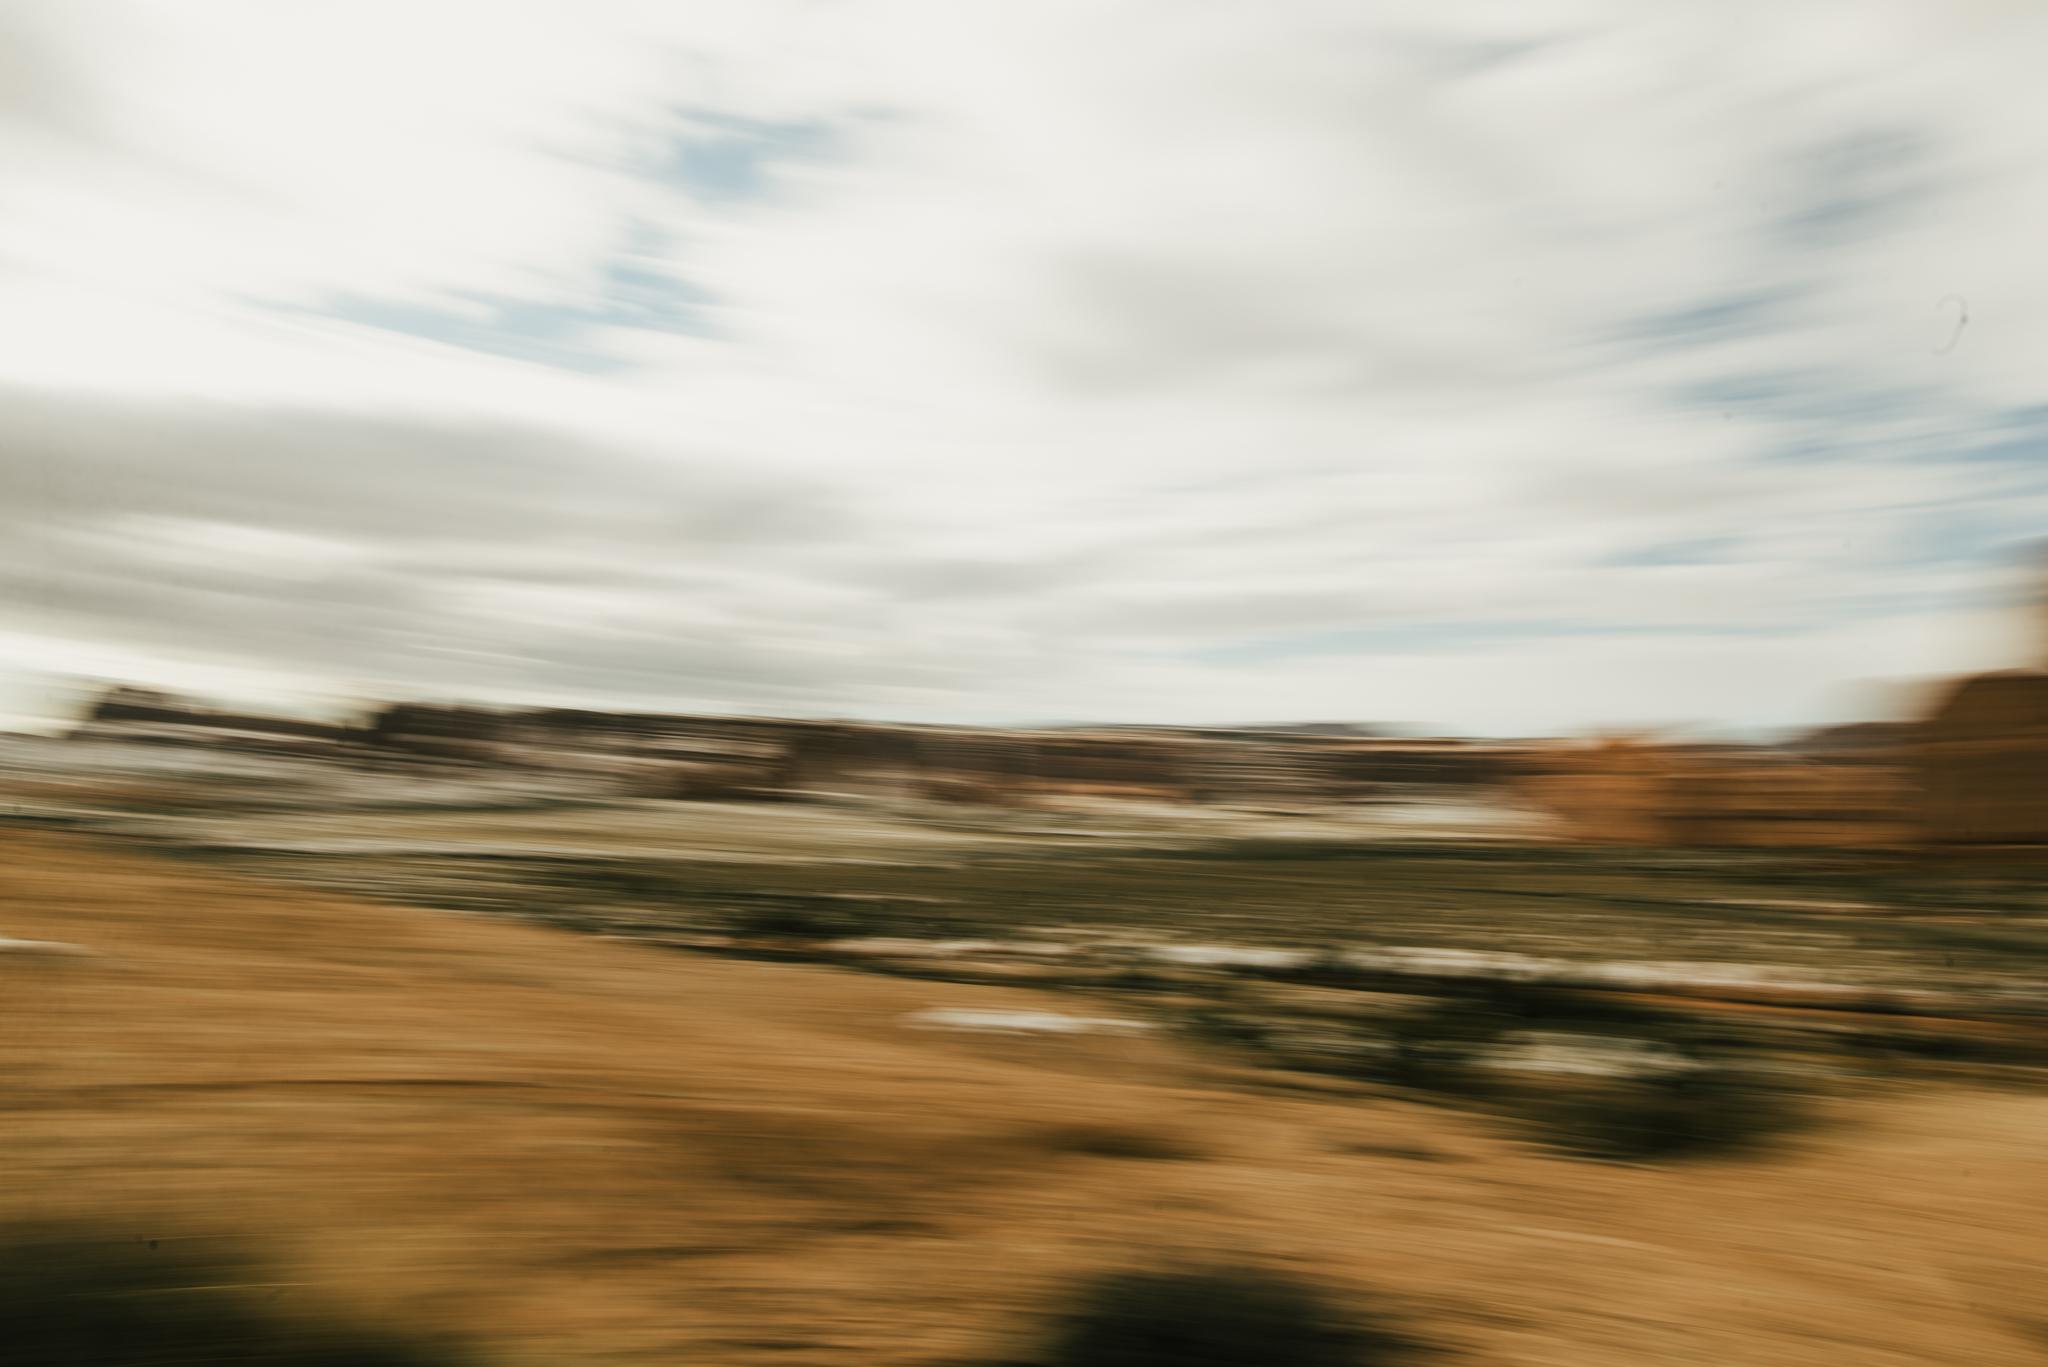 ©The-Ryans-Photography---Arches-National-Park-Moab-Utah-Travel-014.jpg